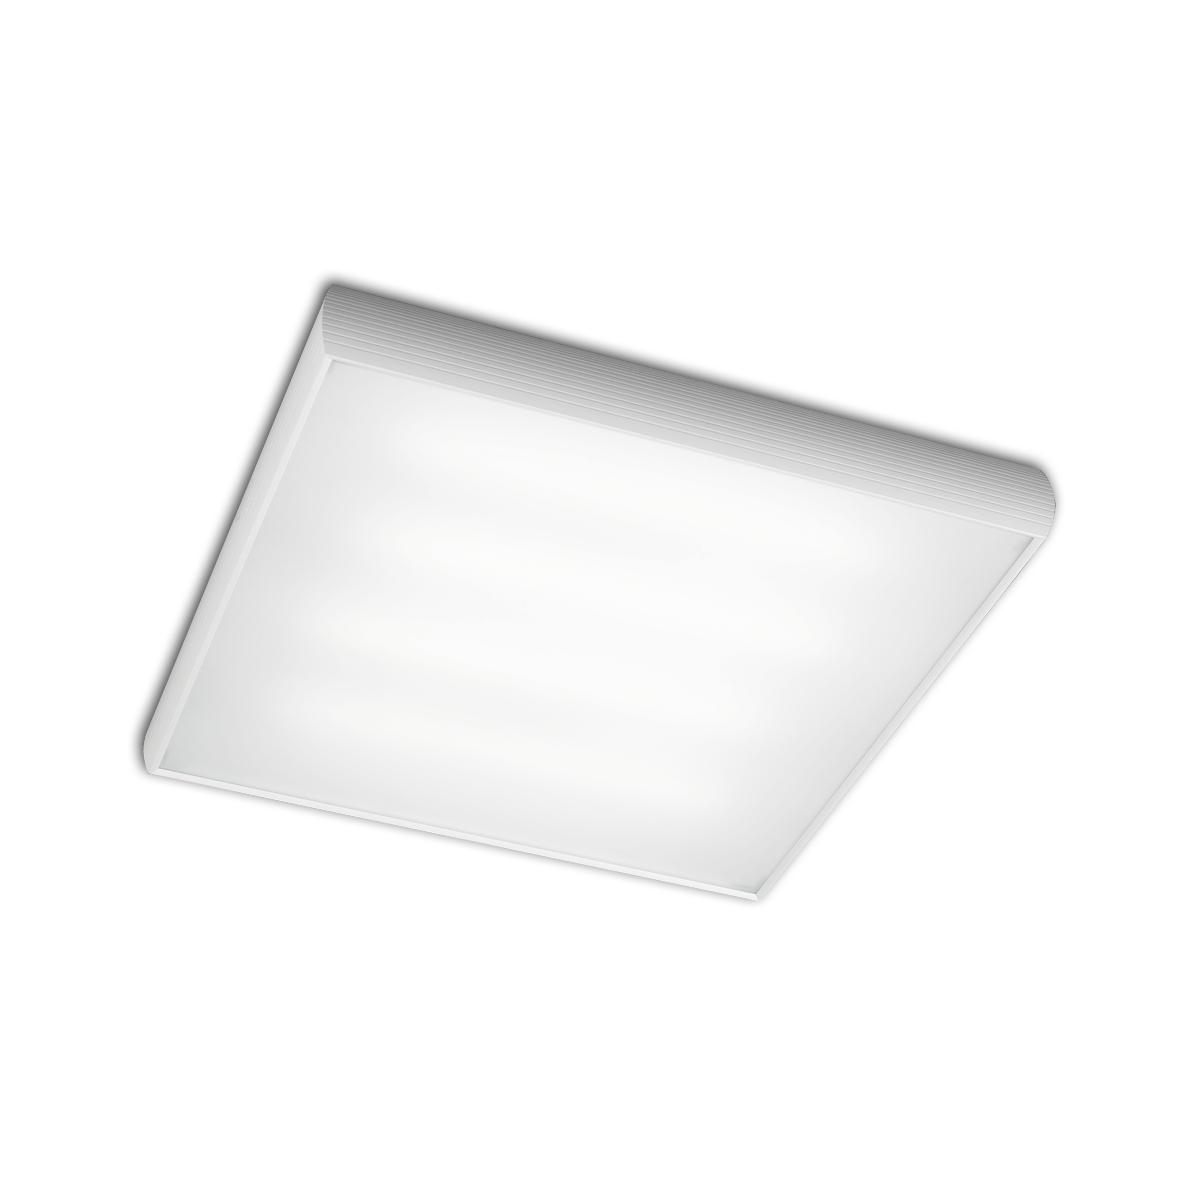 Aluminium ceiling lamp ELECTRON.4xE27 20w white matt